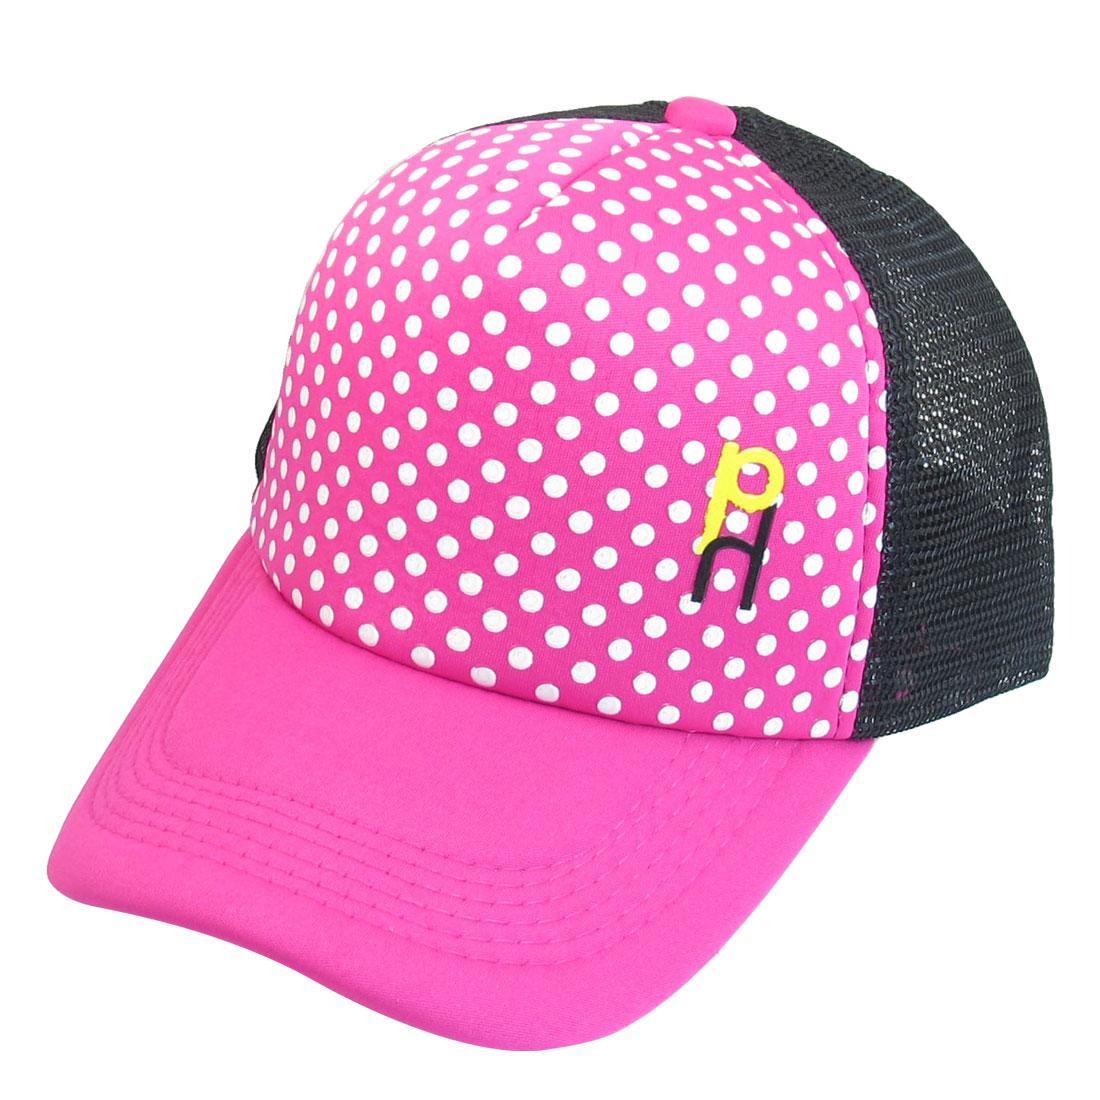 Fuchsia Black Mesh Dotted Print Adjustable Strap Sun Visor Hat Cap for Women